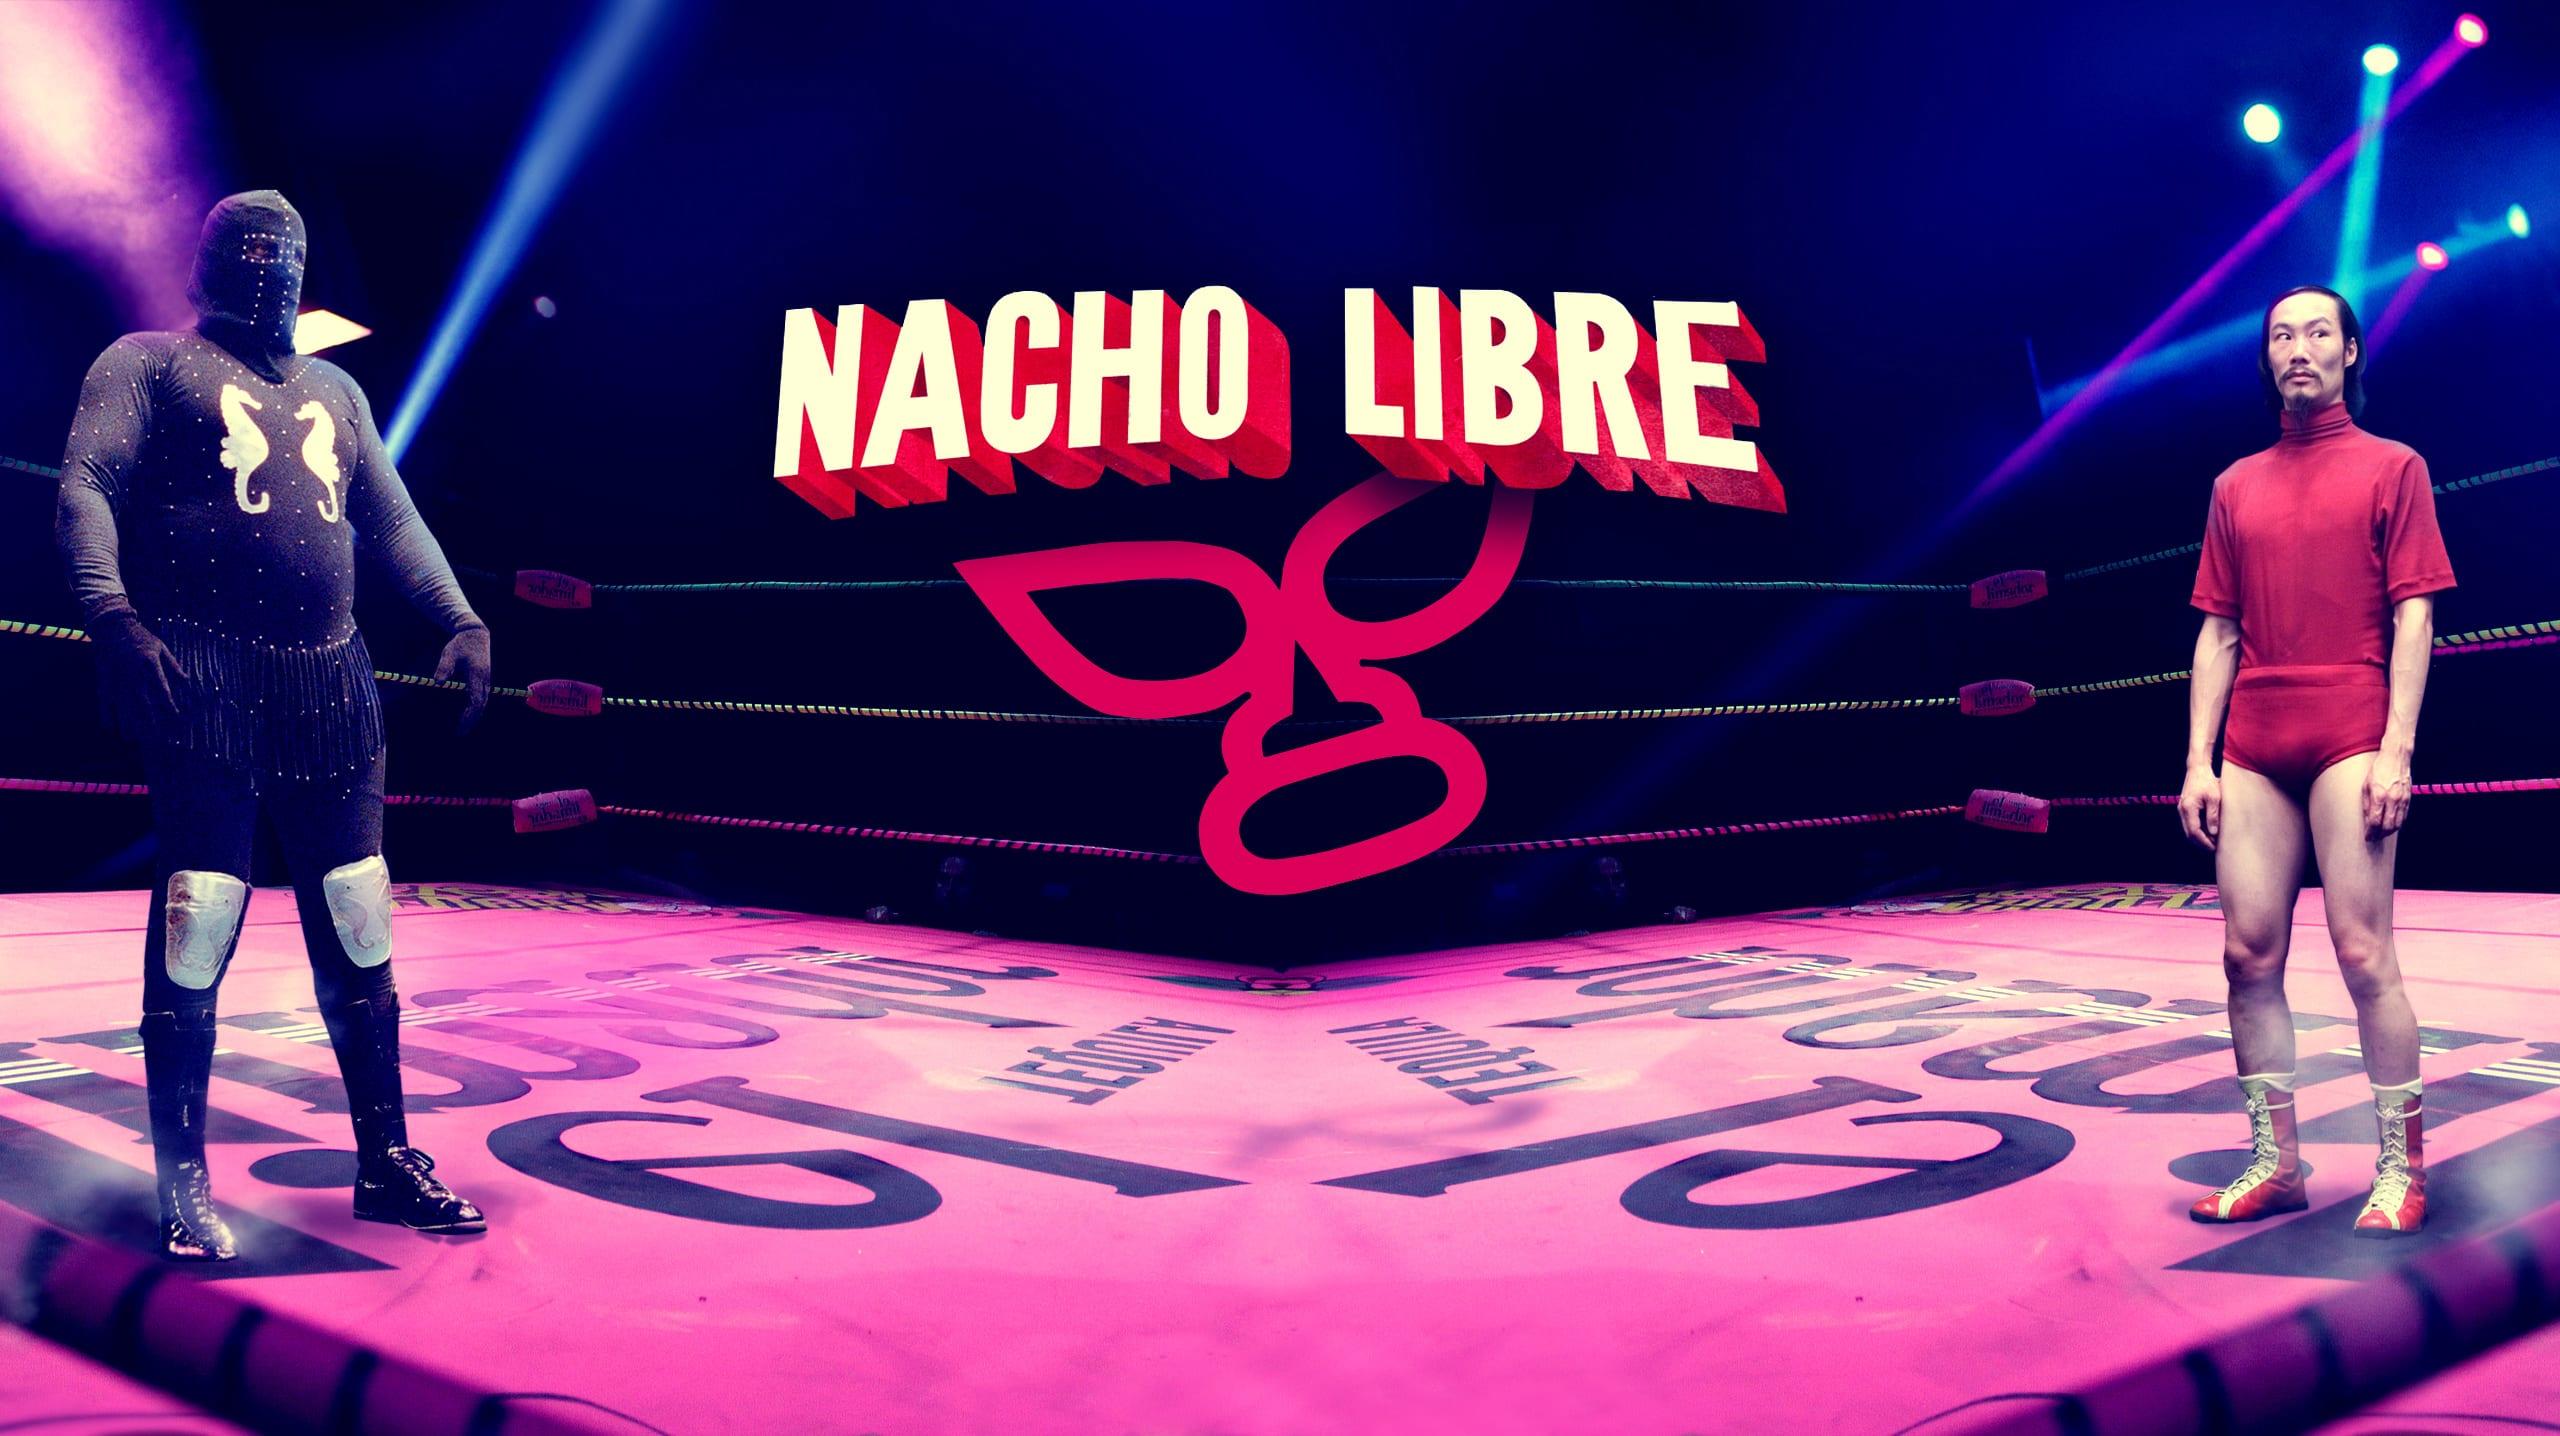 Nacho Libre online slots game logo